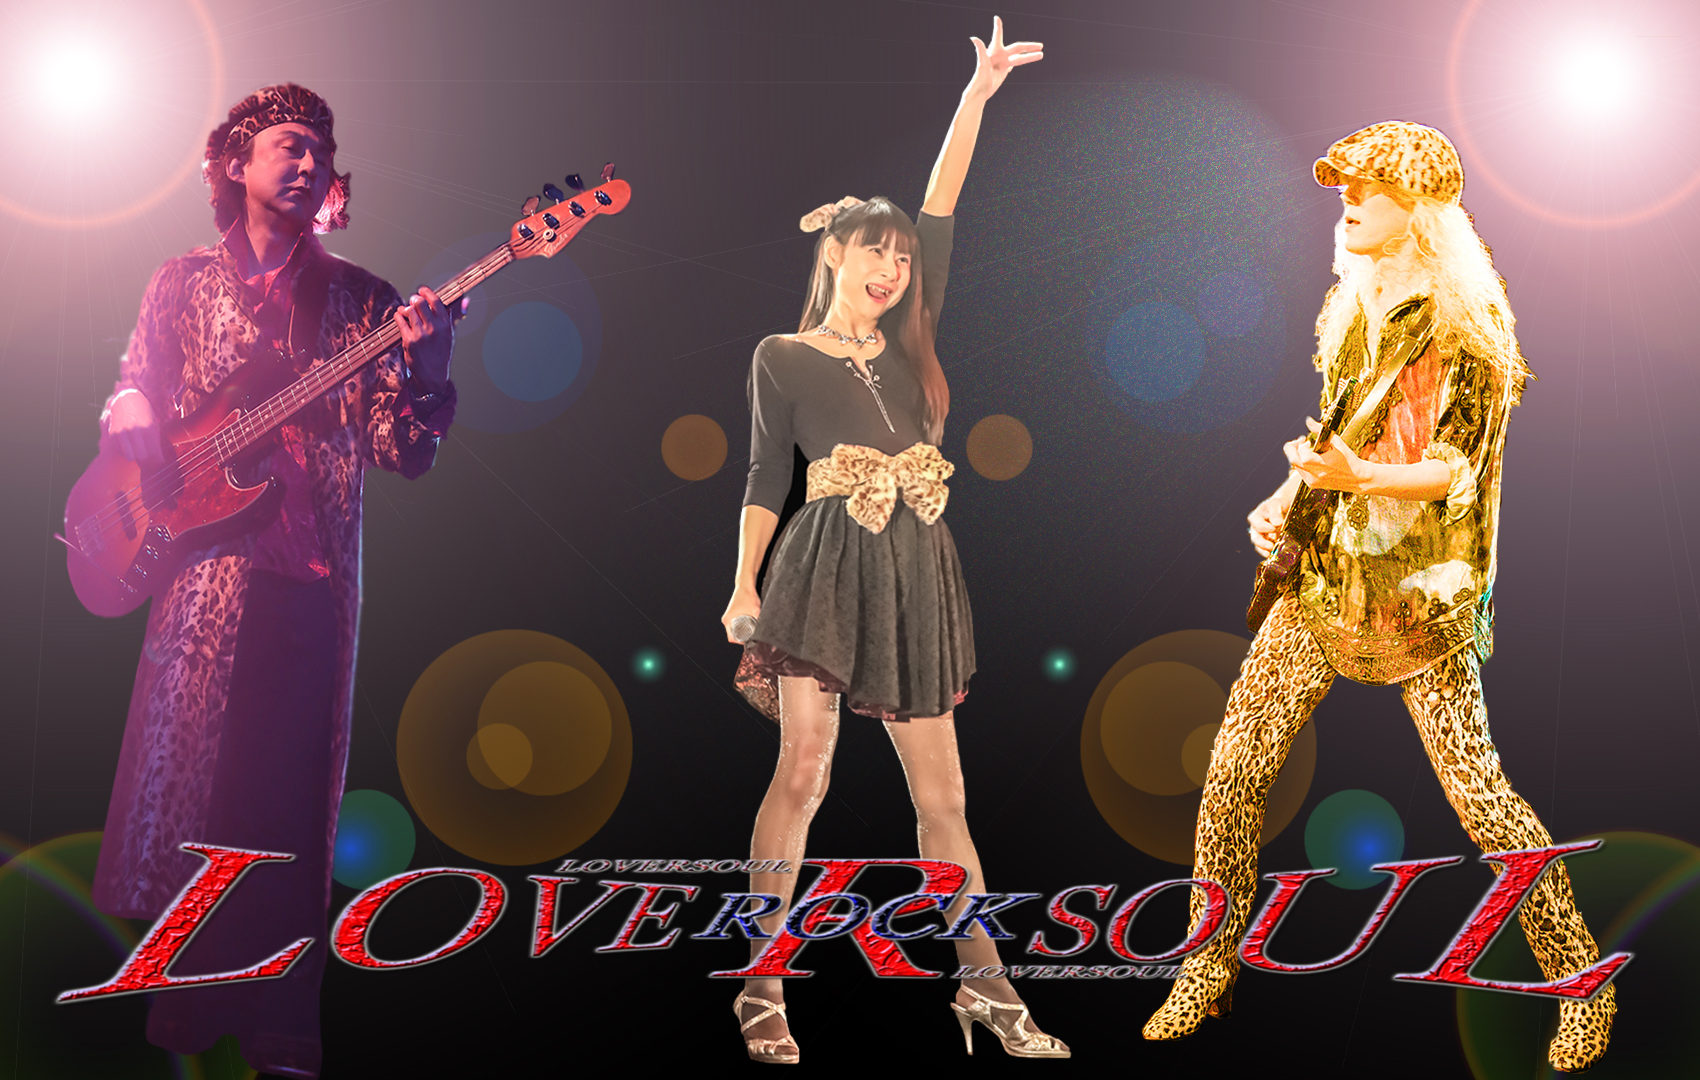 Permalink to: LOVE R SOUL(亀井薫)